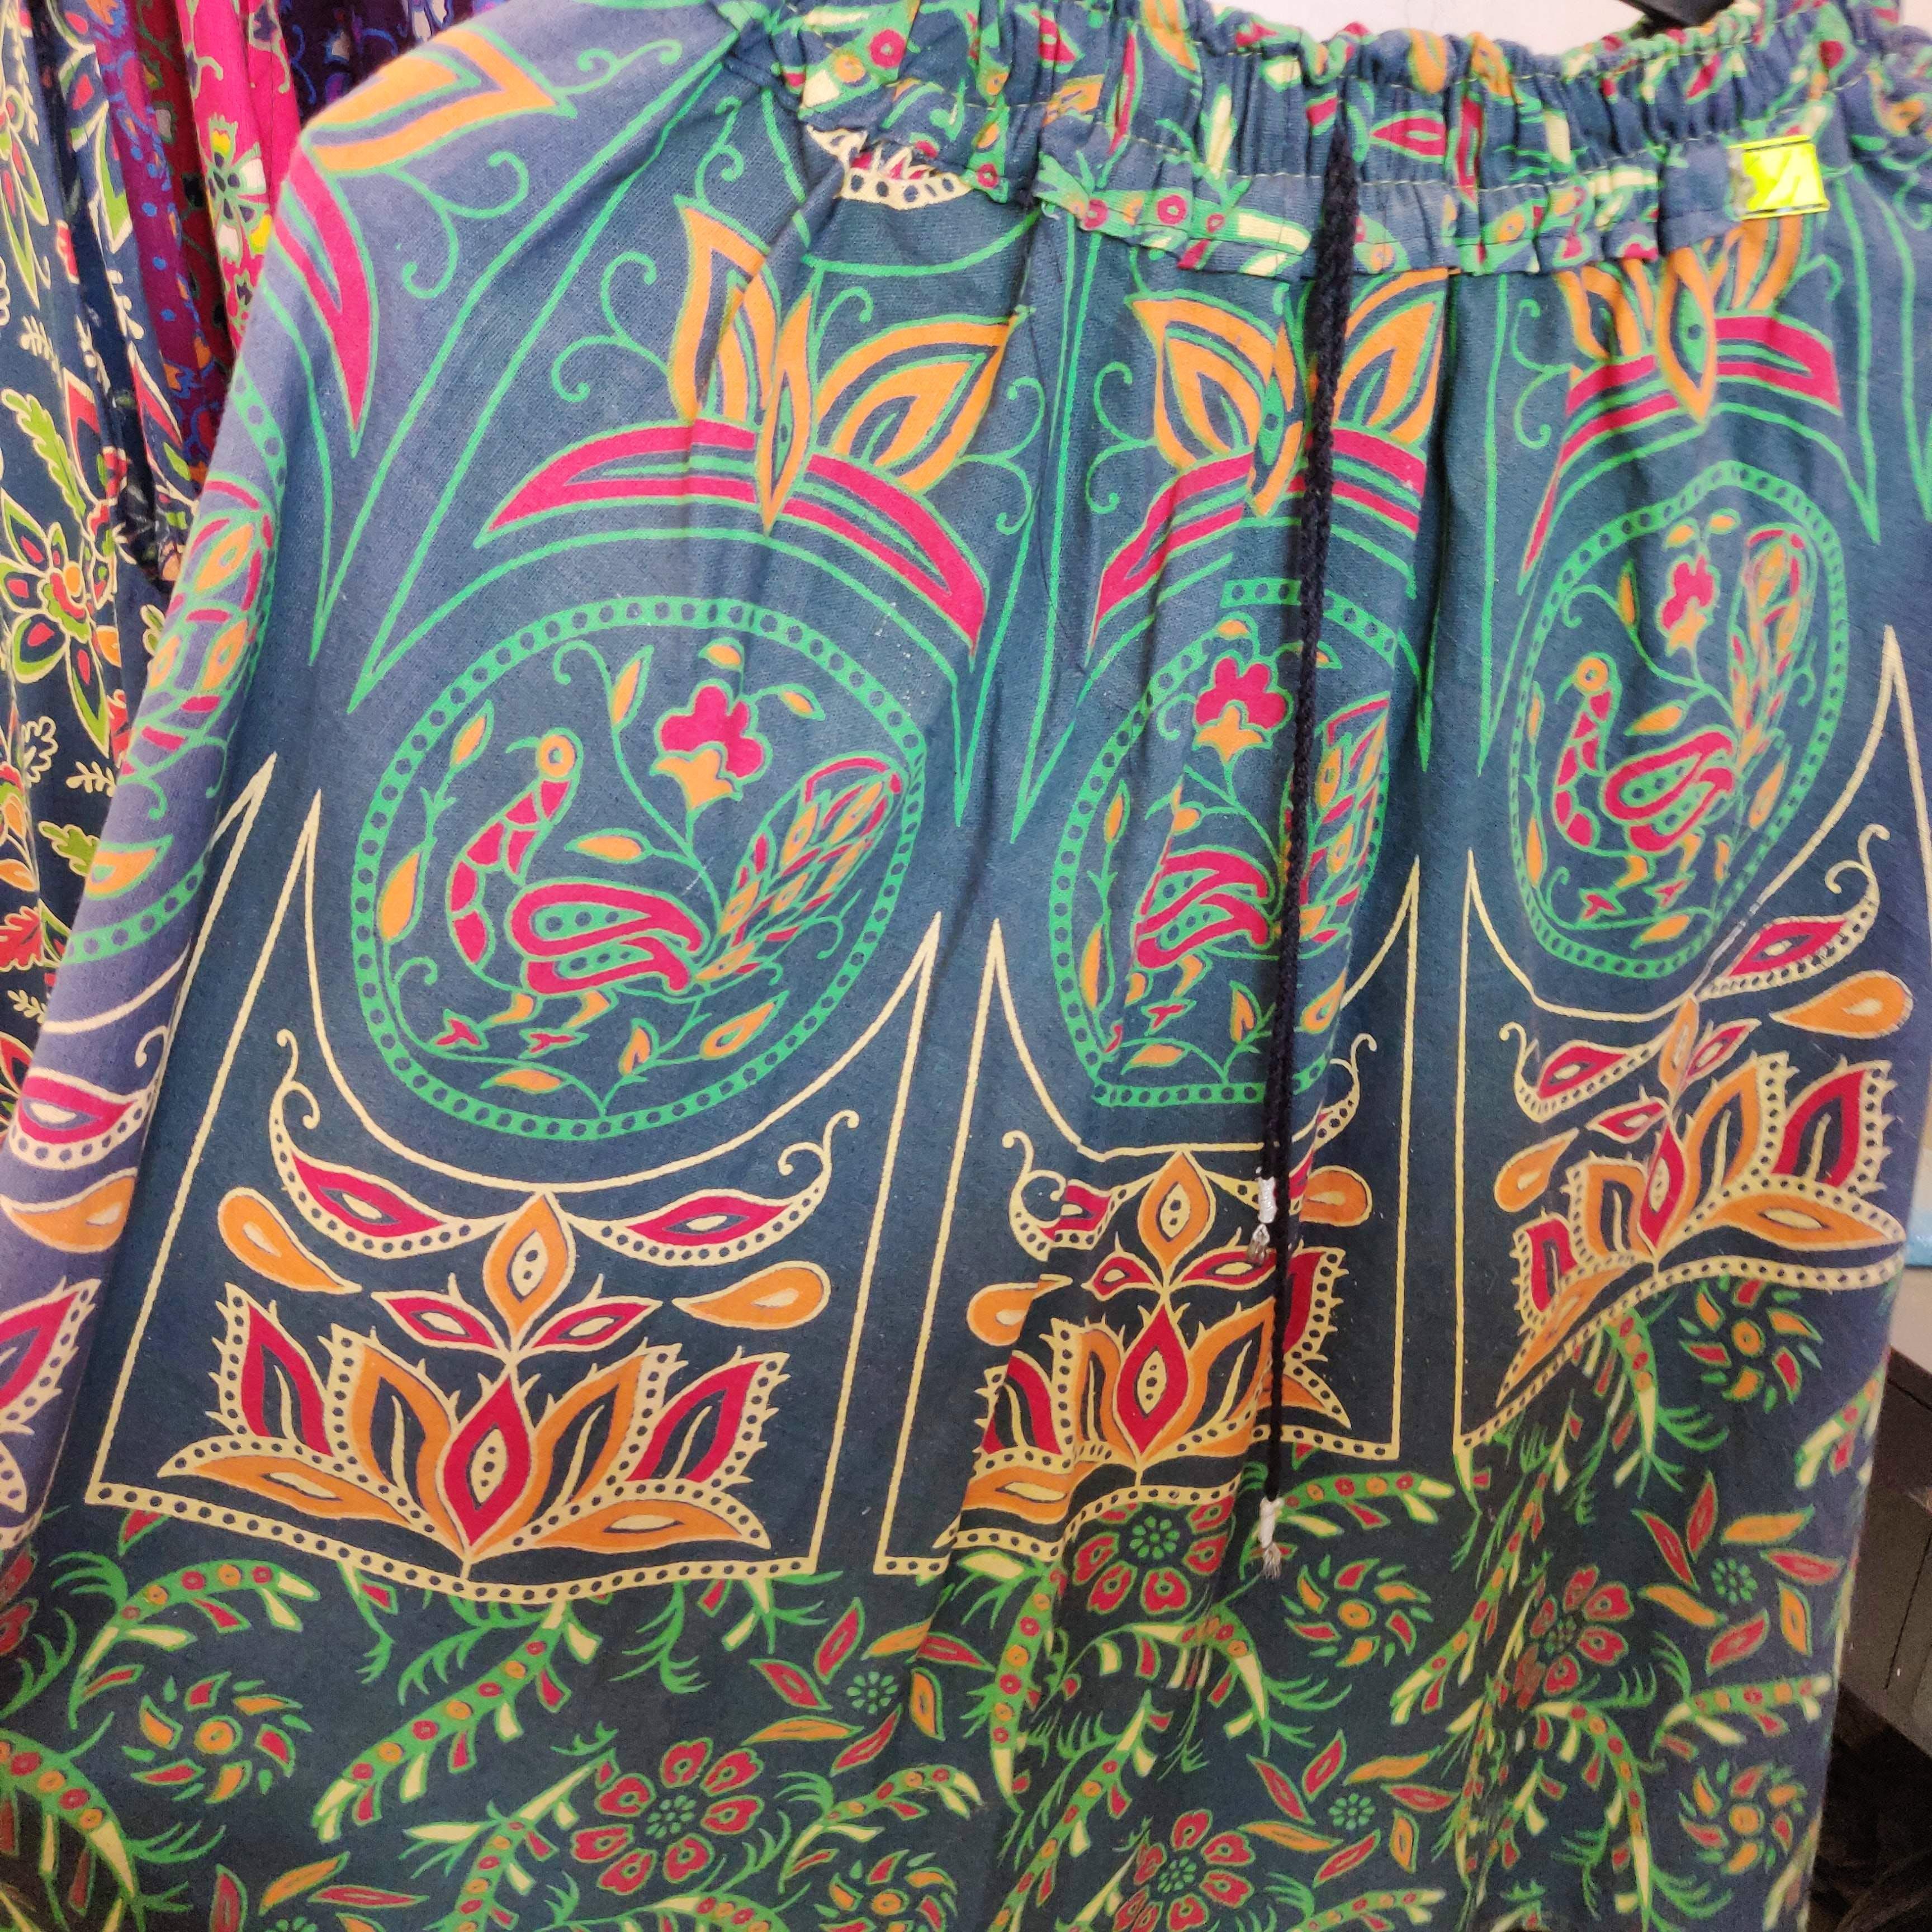 Clothing,Pattern,Visual arts,Motif,Textile,Art,Design,Paisley,Pattern,Sleeve